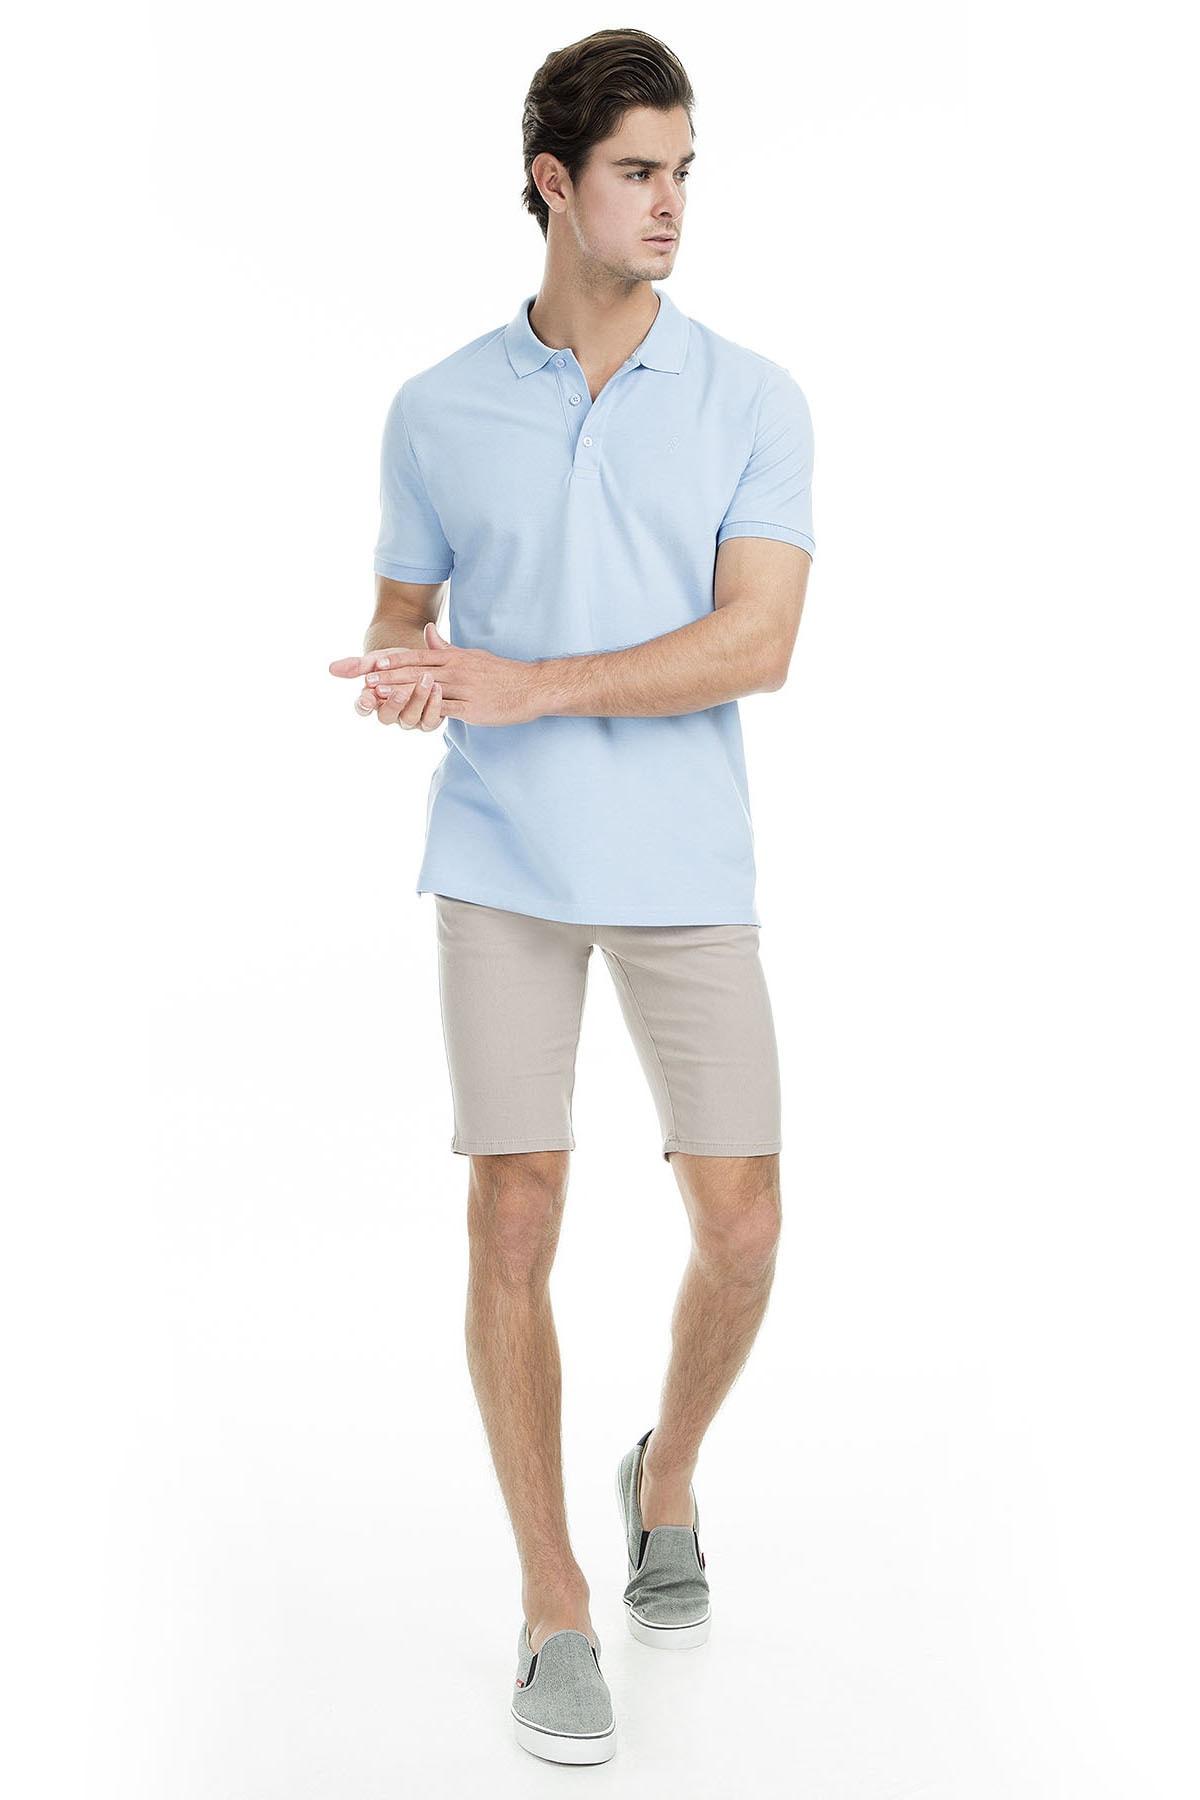 Sabri Özel Erkek Açık Mavi Polo Yaka T-Shirt - T446688 4